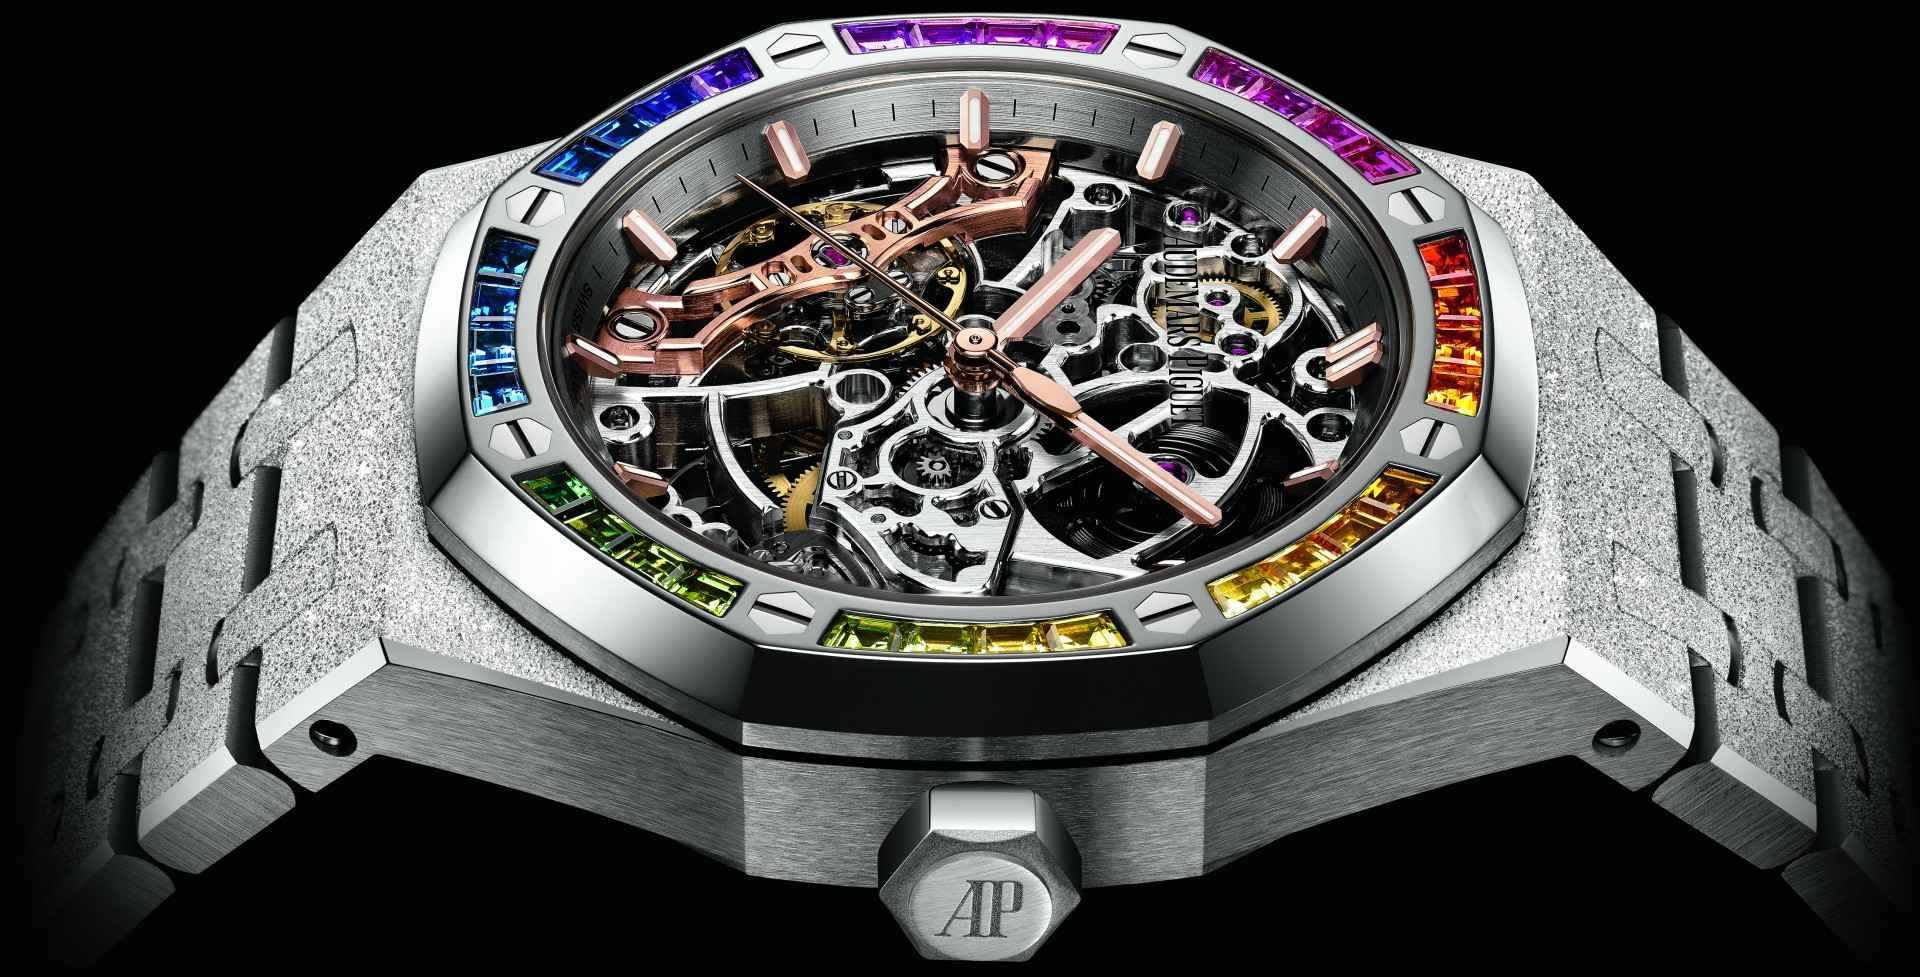 【SIHH 2019錶展報導】彩虹彩虹真美麗:愛彼推出多款高亮點寶石鑲嵌時計款式